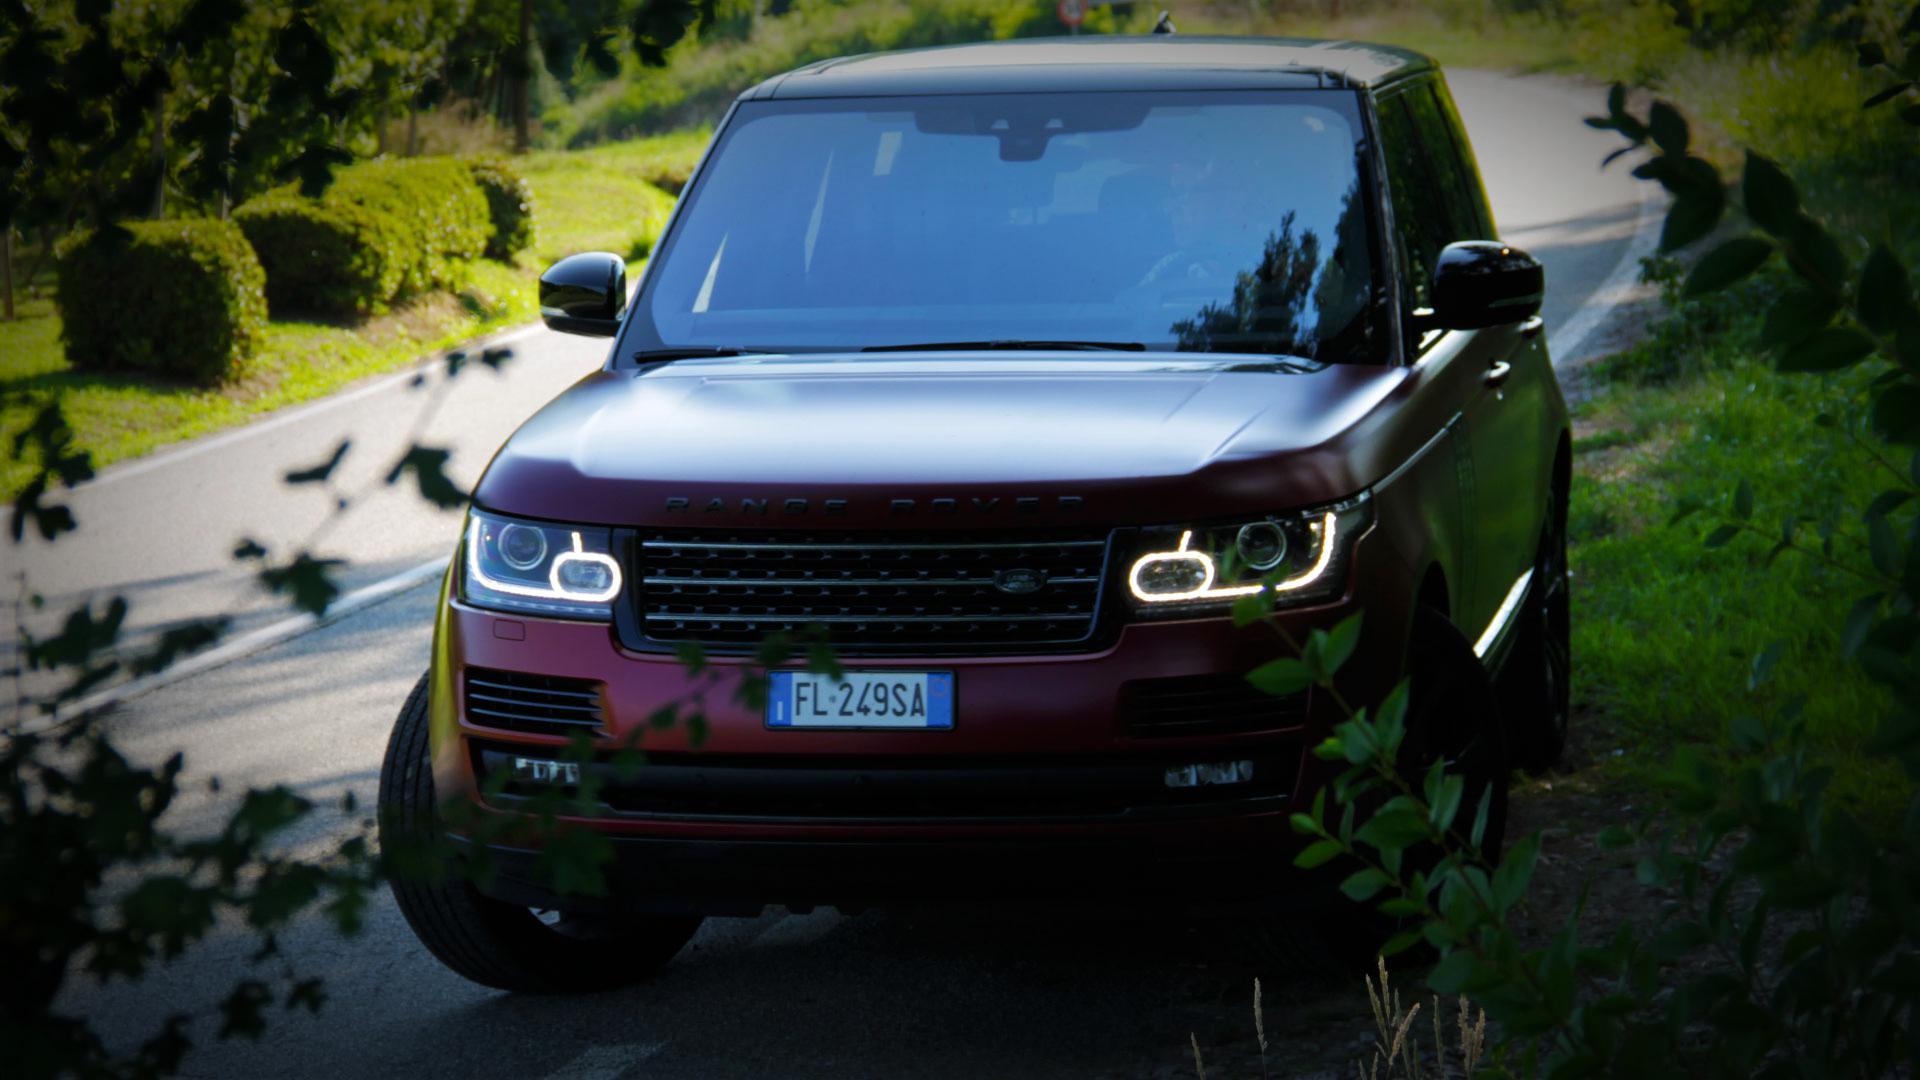 range-rover-vogue-svautobiography-prova-test